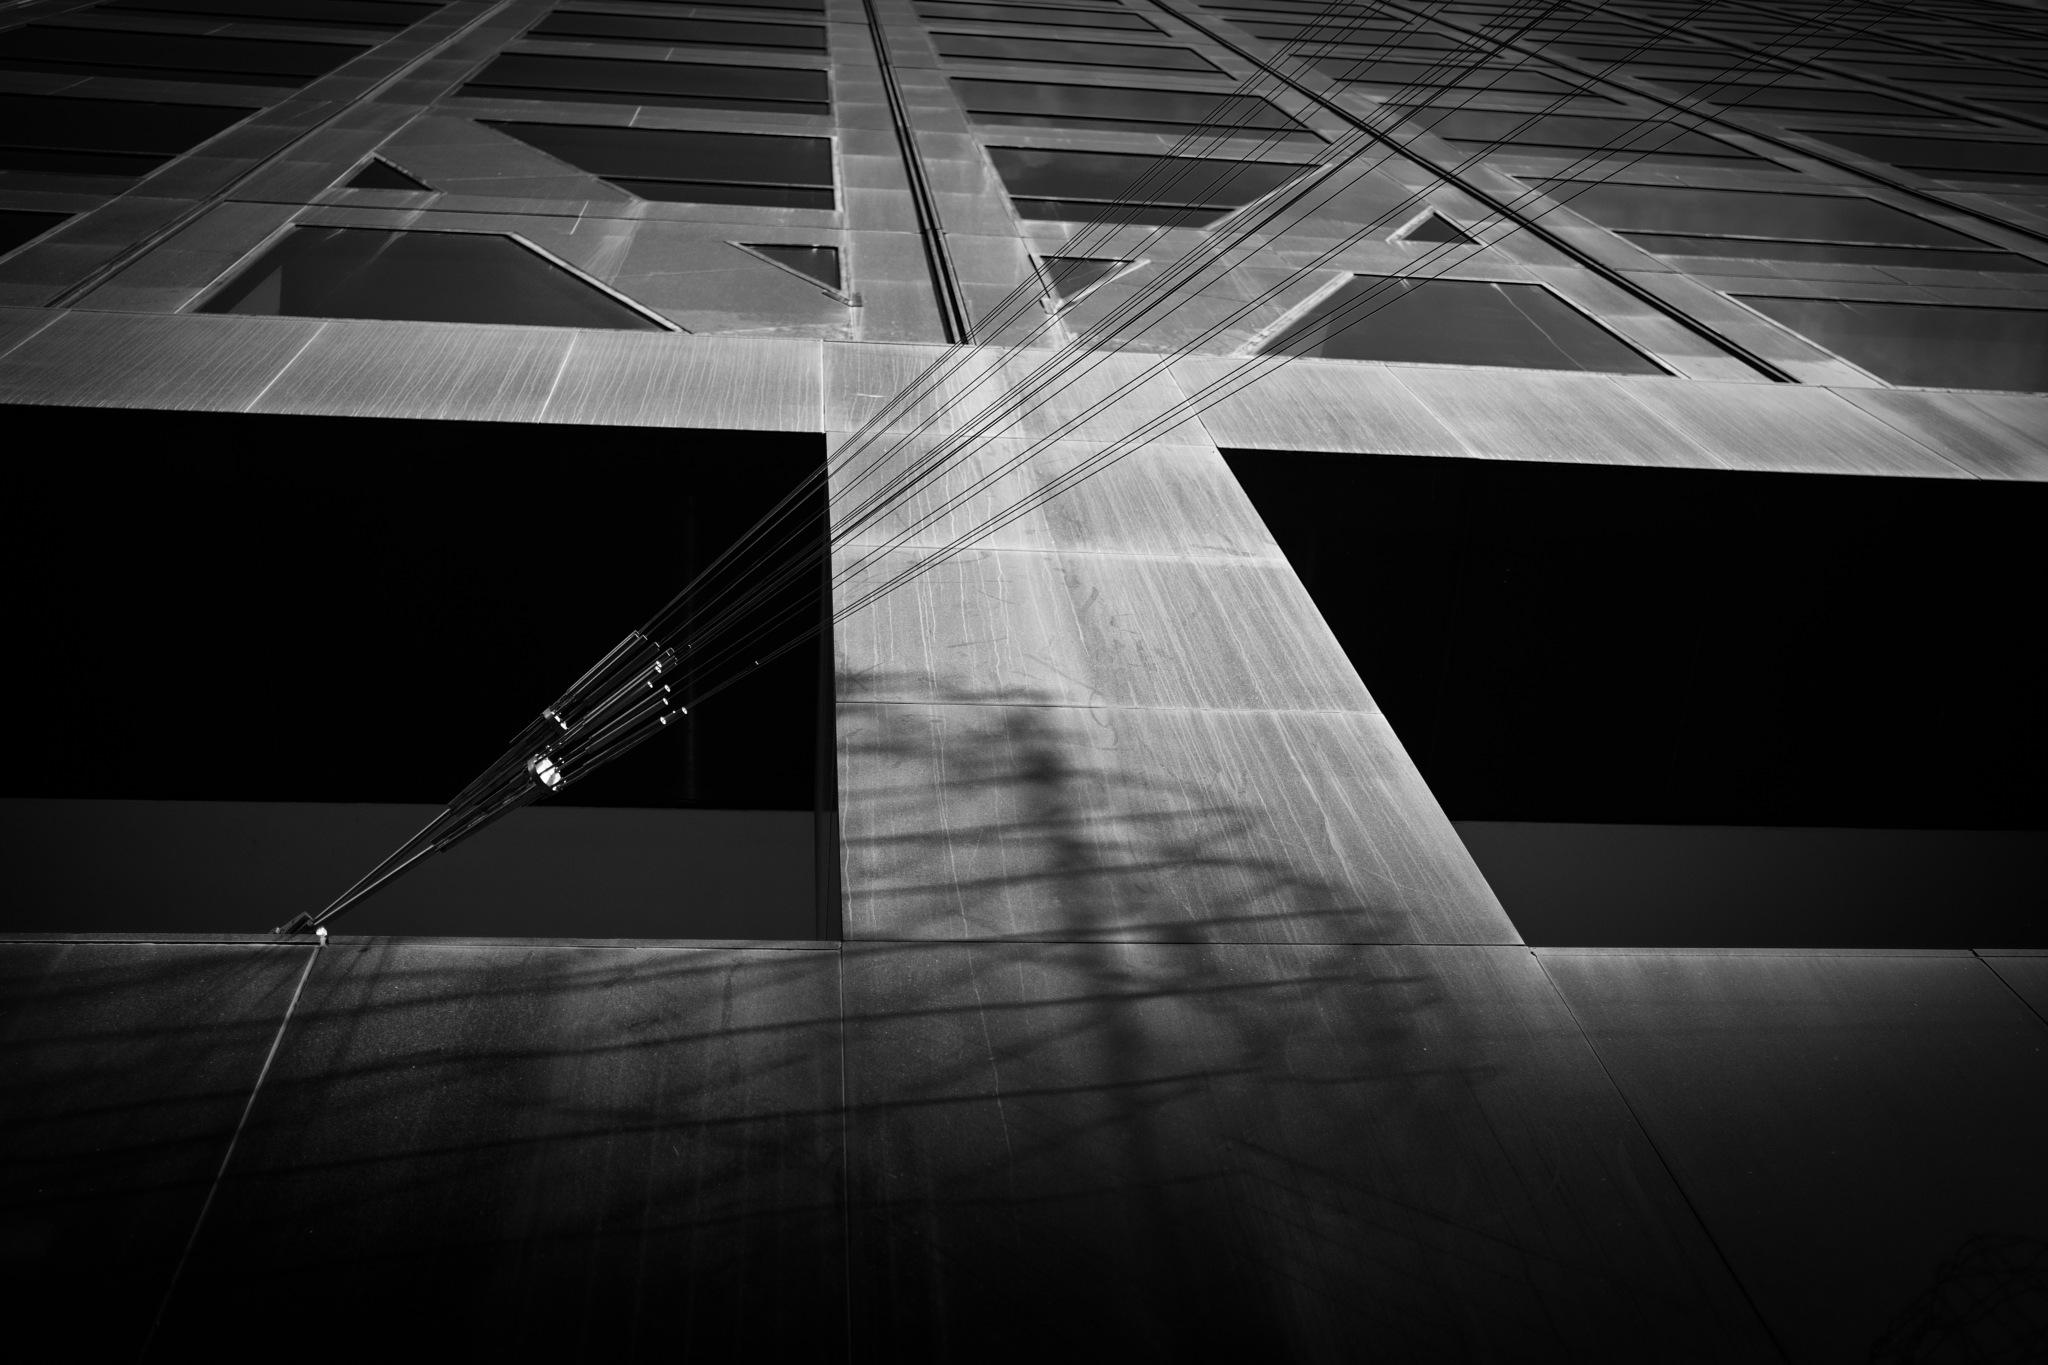 Light Trance by Peter Denniston